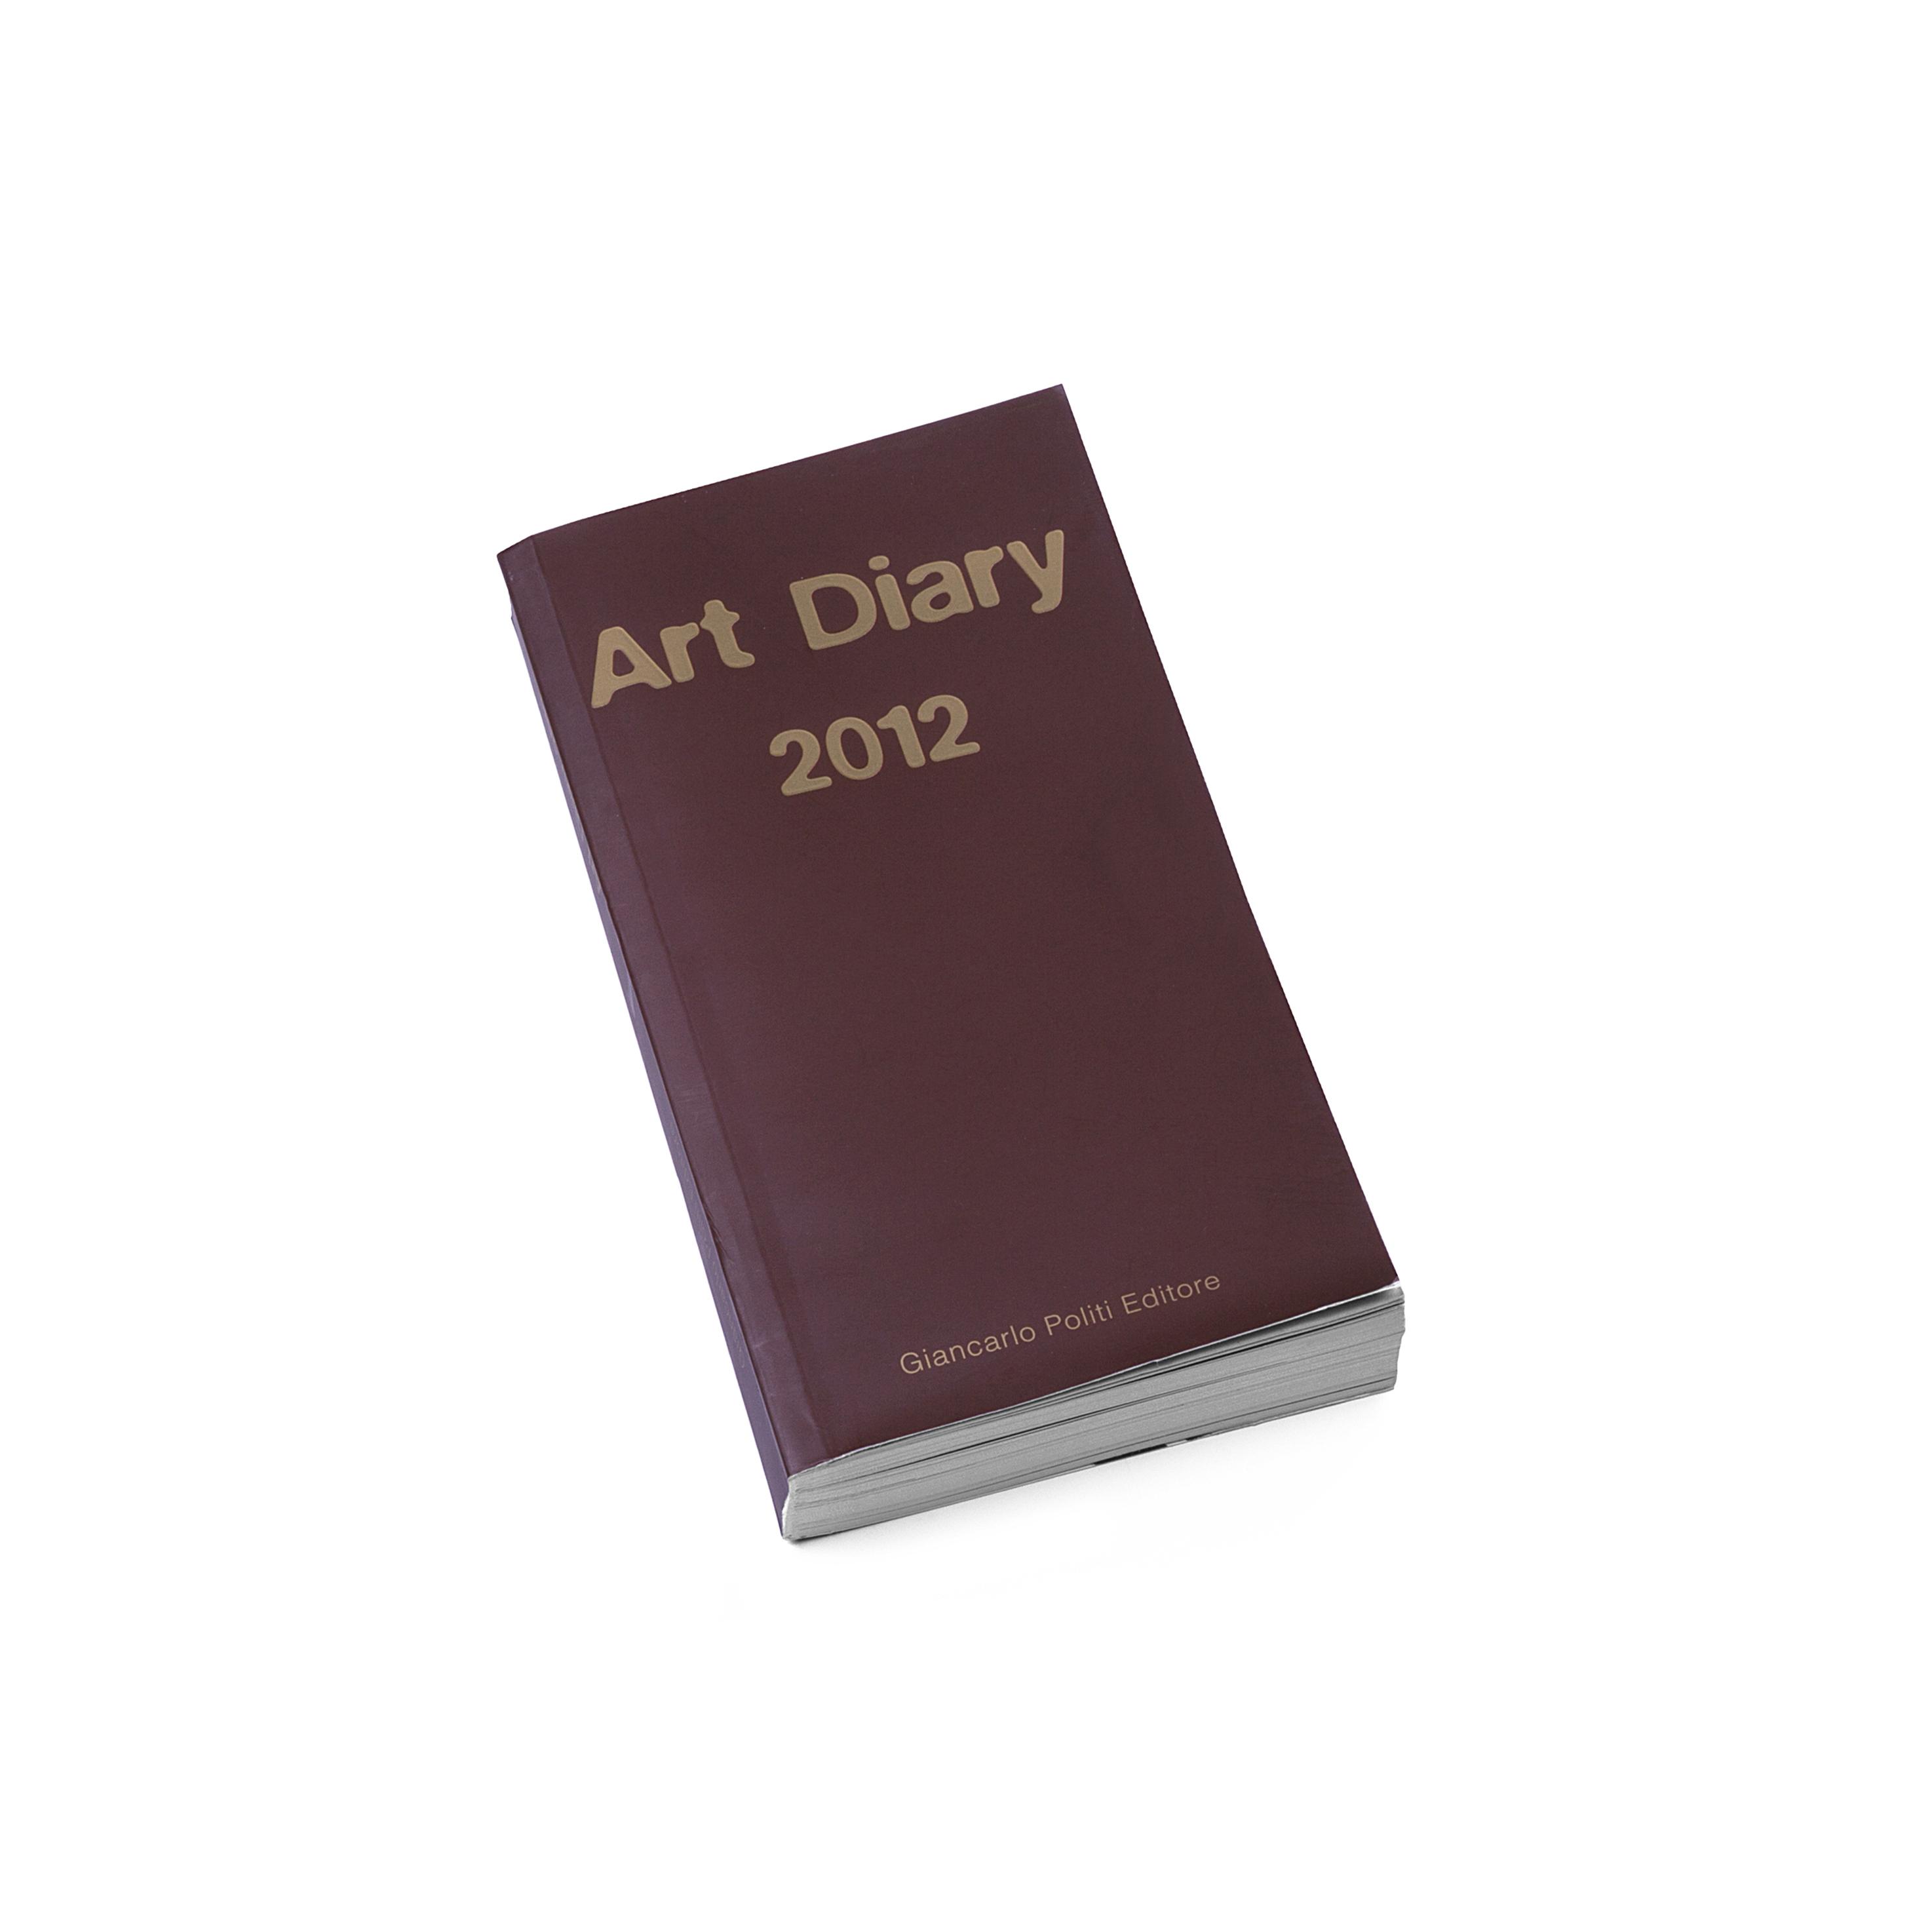 018_ArtDiary 2012 (high)